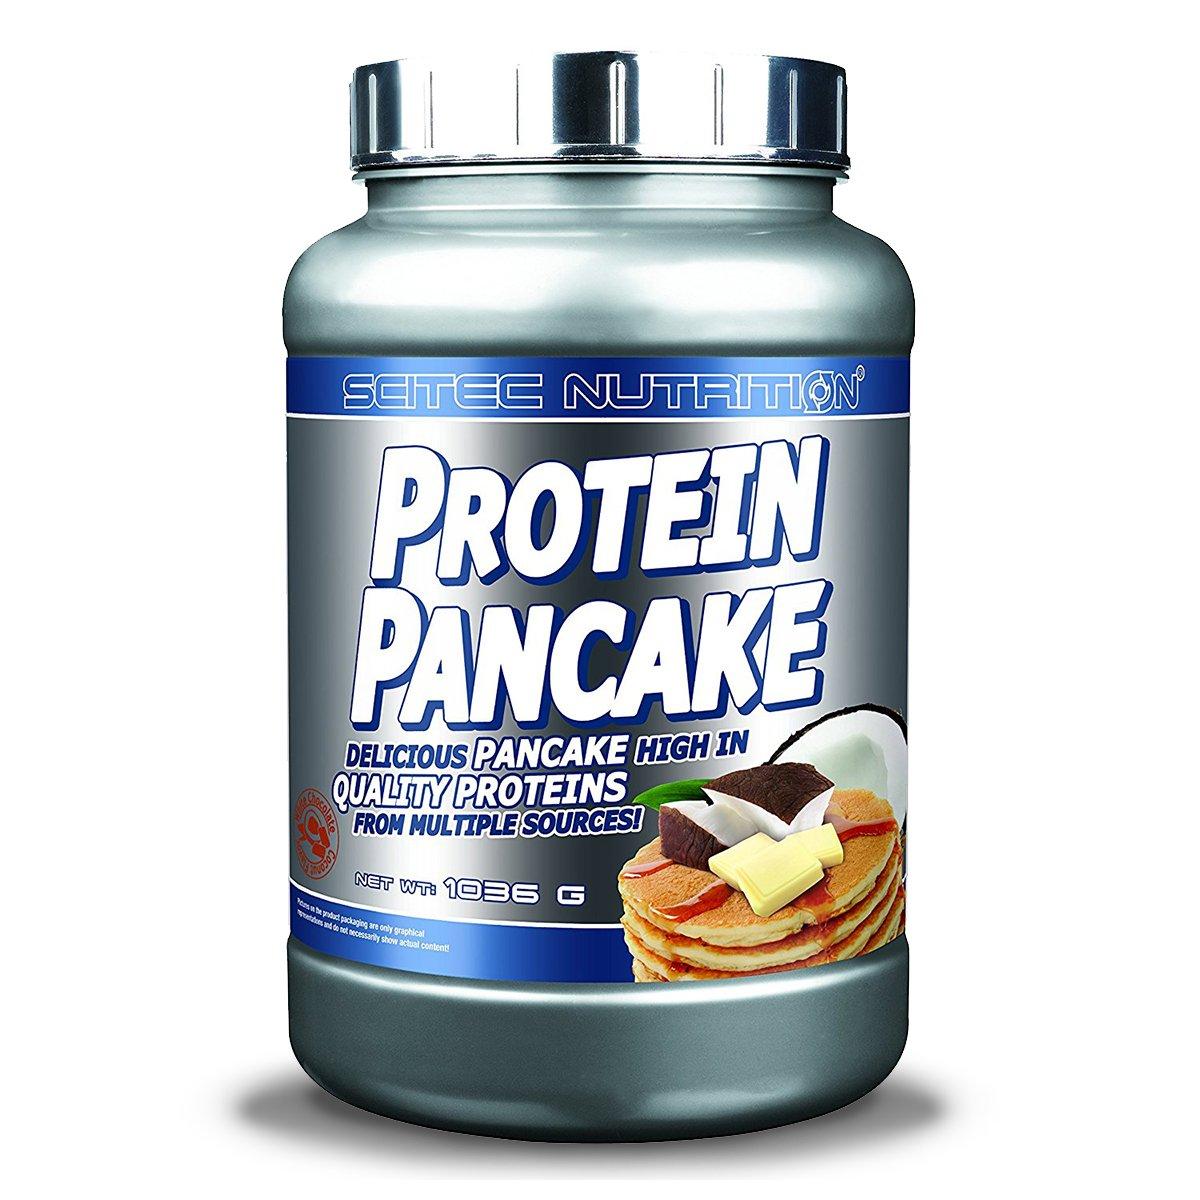 Scitec Nutrition Protein Pancake Mix - 2.28 Pound, White Chocolate Coconut